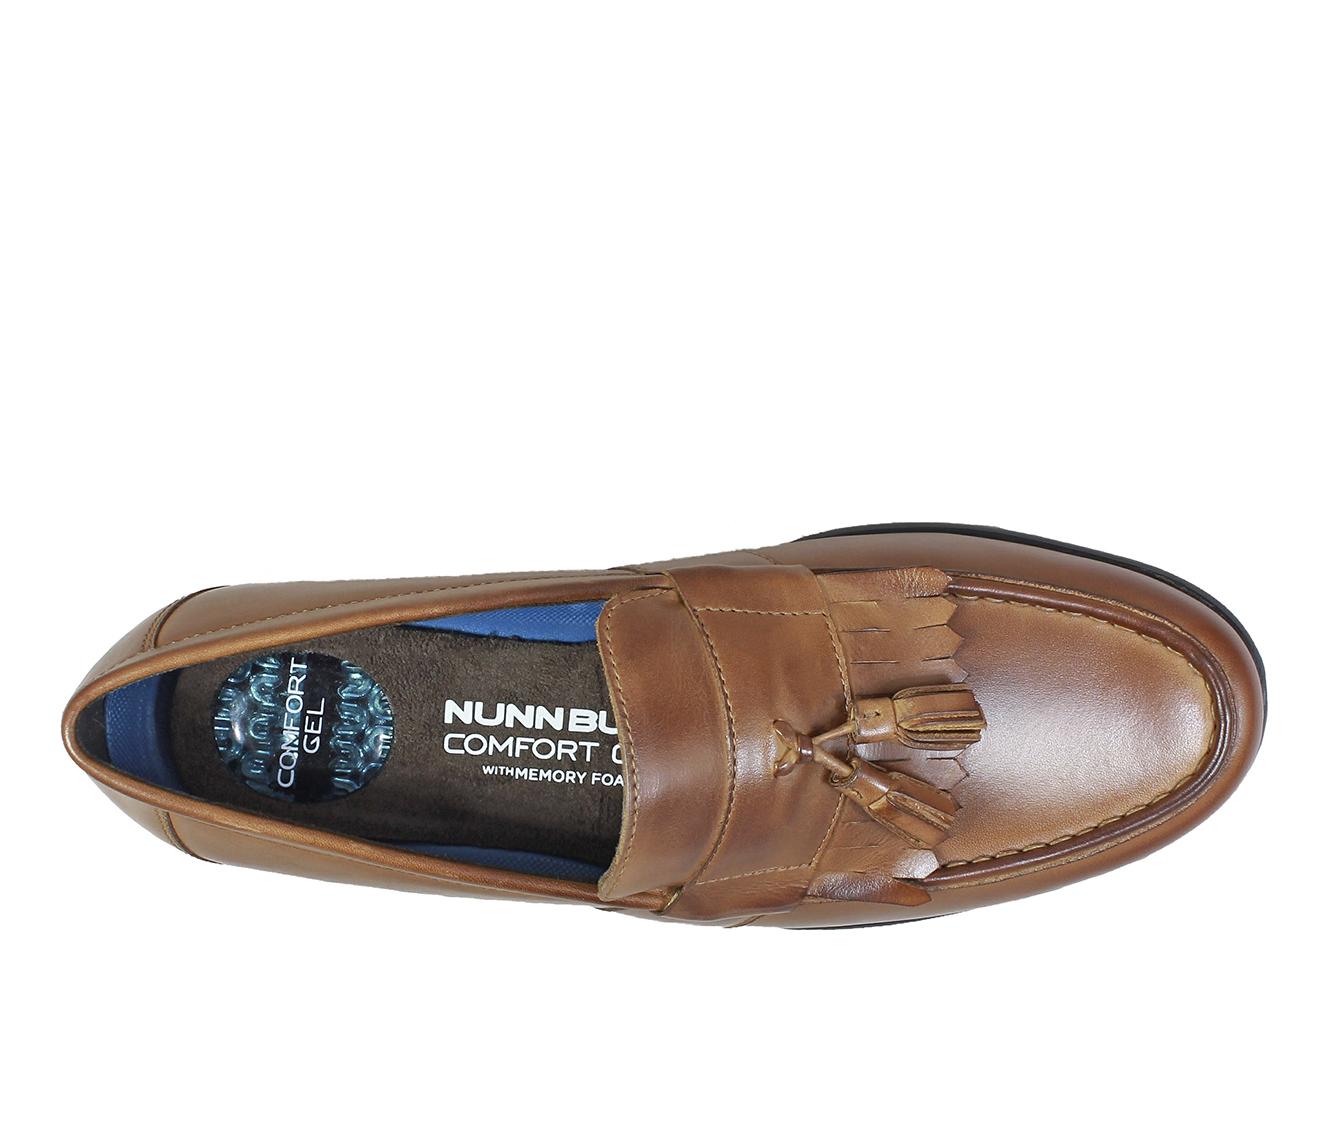 Men's Nunn Bush Denzel Moc Toe Loafers